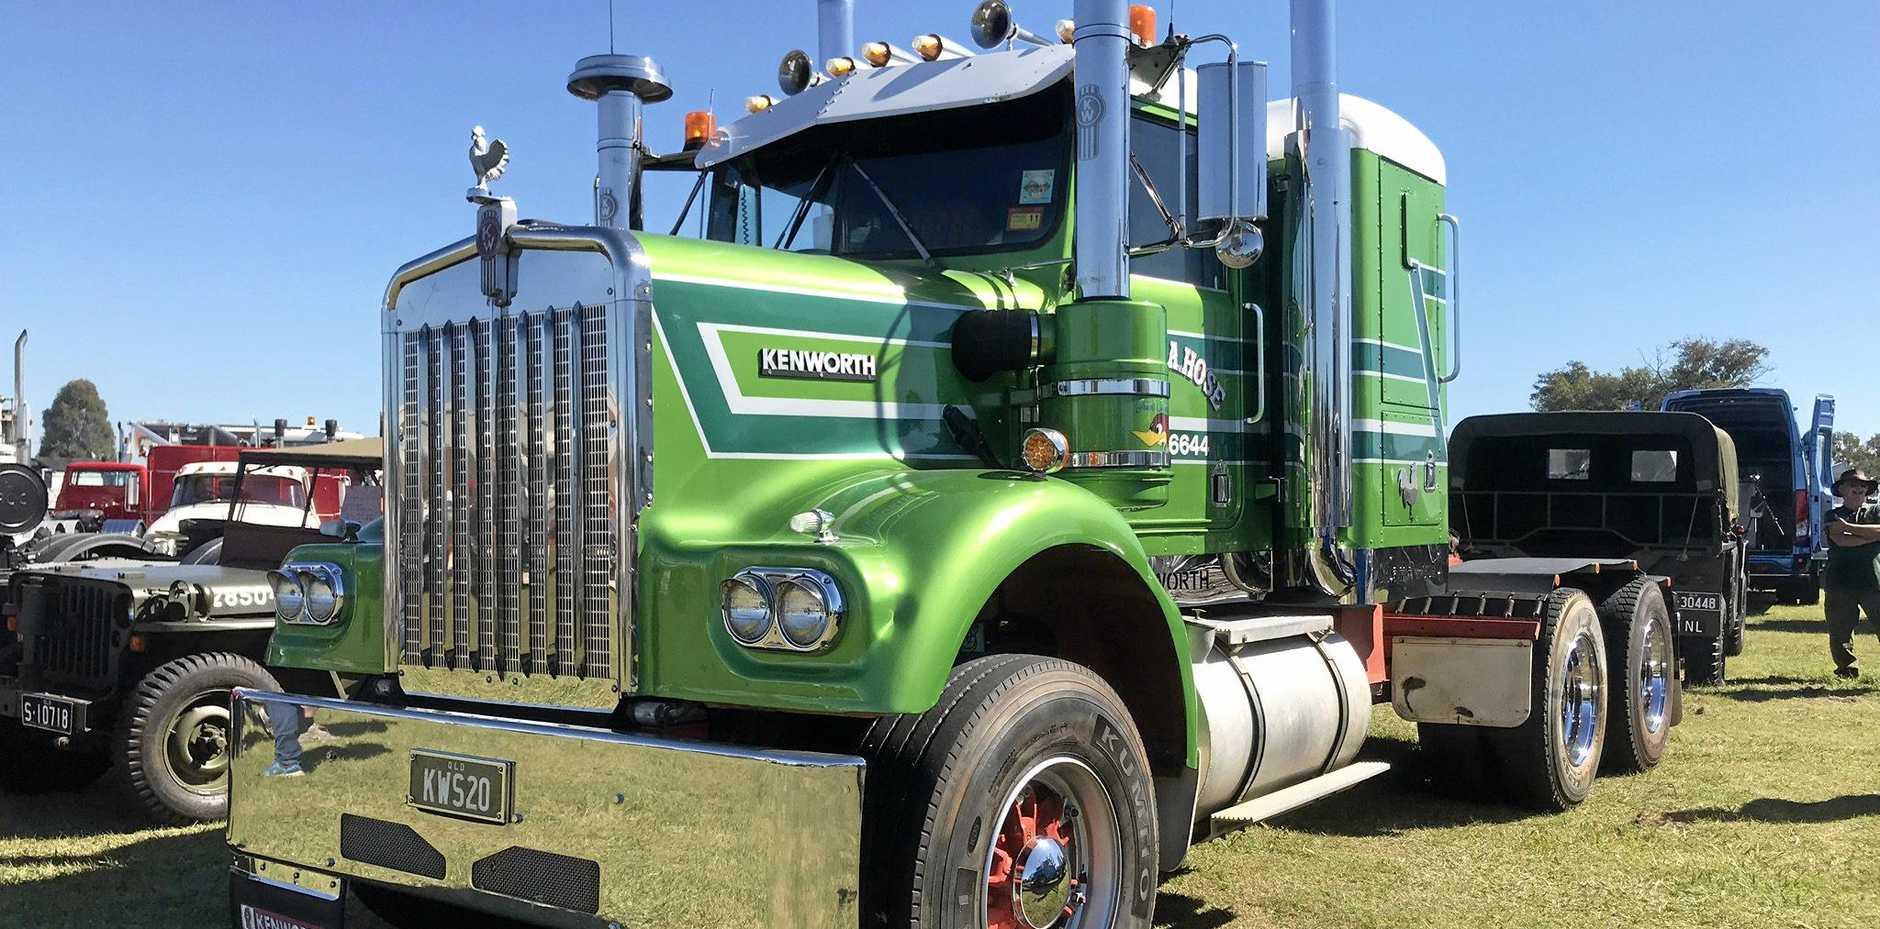 Heritage Truck Association's annual truck show at Rocklea, Brisbane, Queensland.